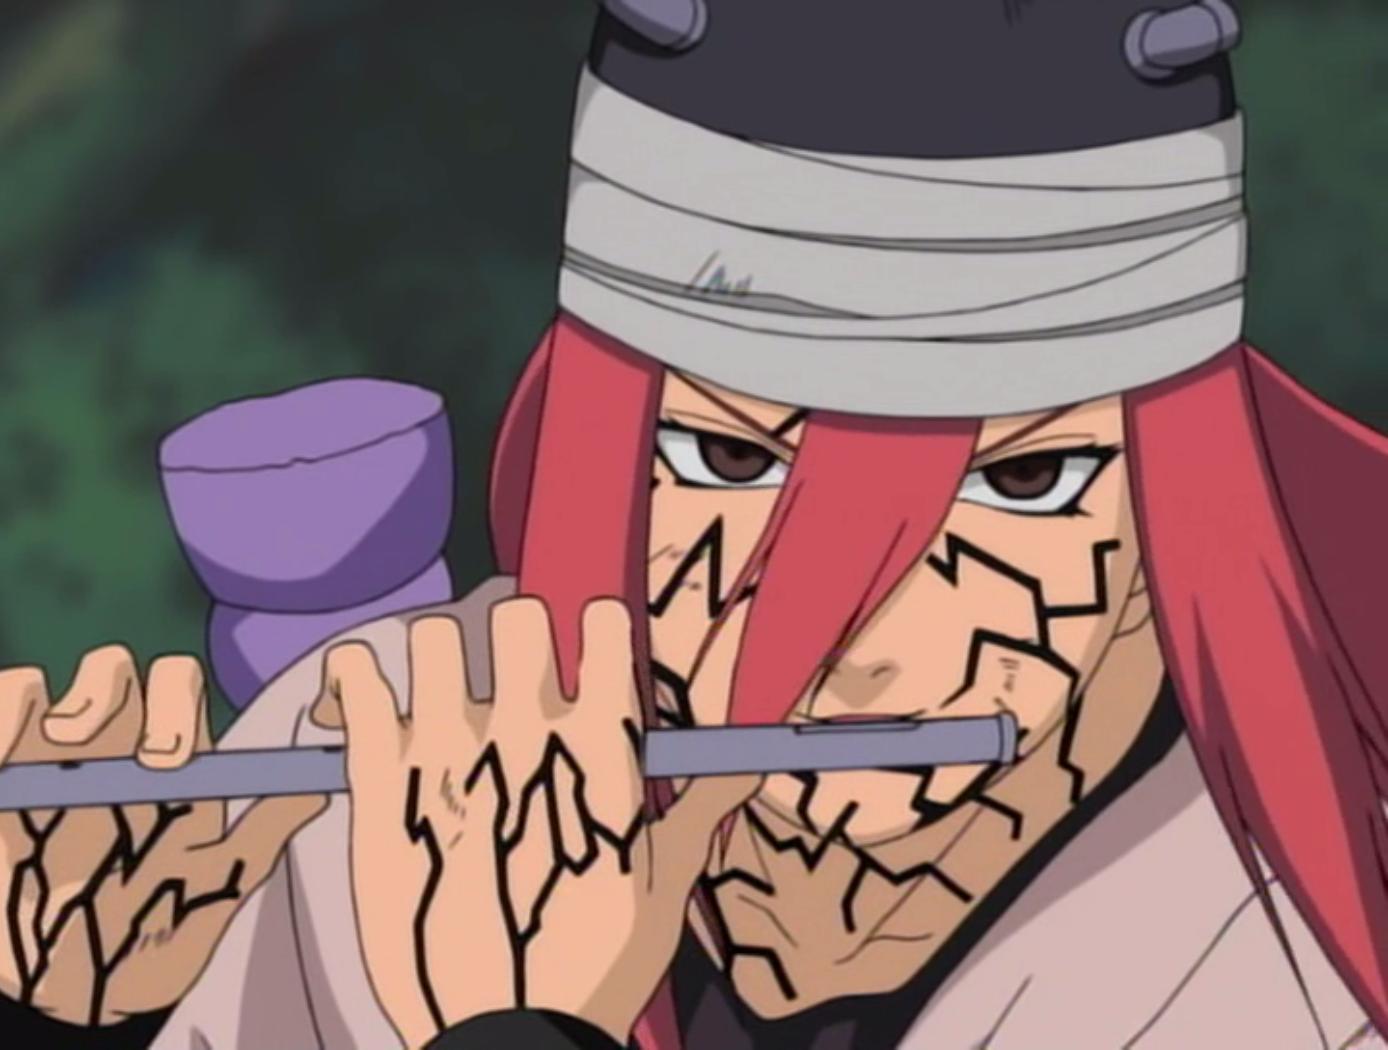 Tayuya | Narutopedia | FANDOM powered by Wikia